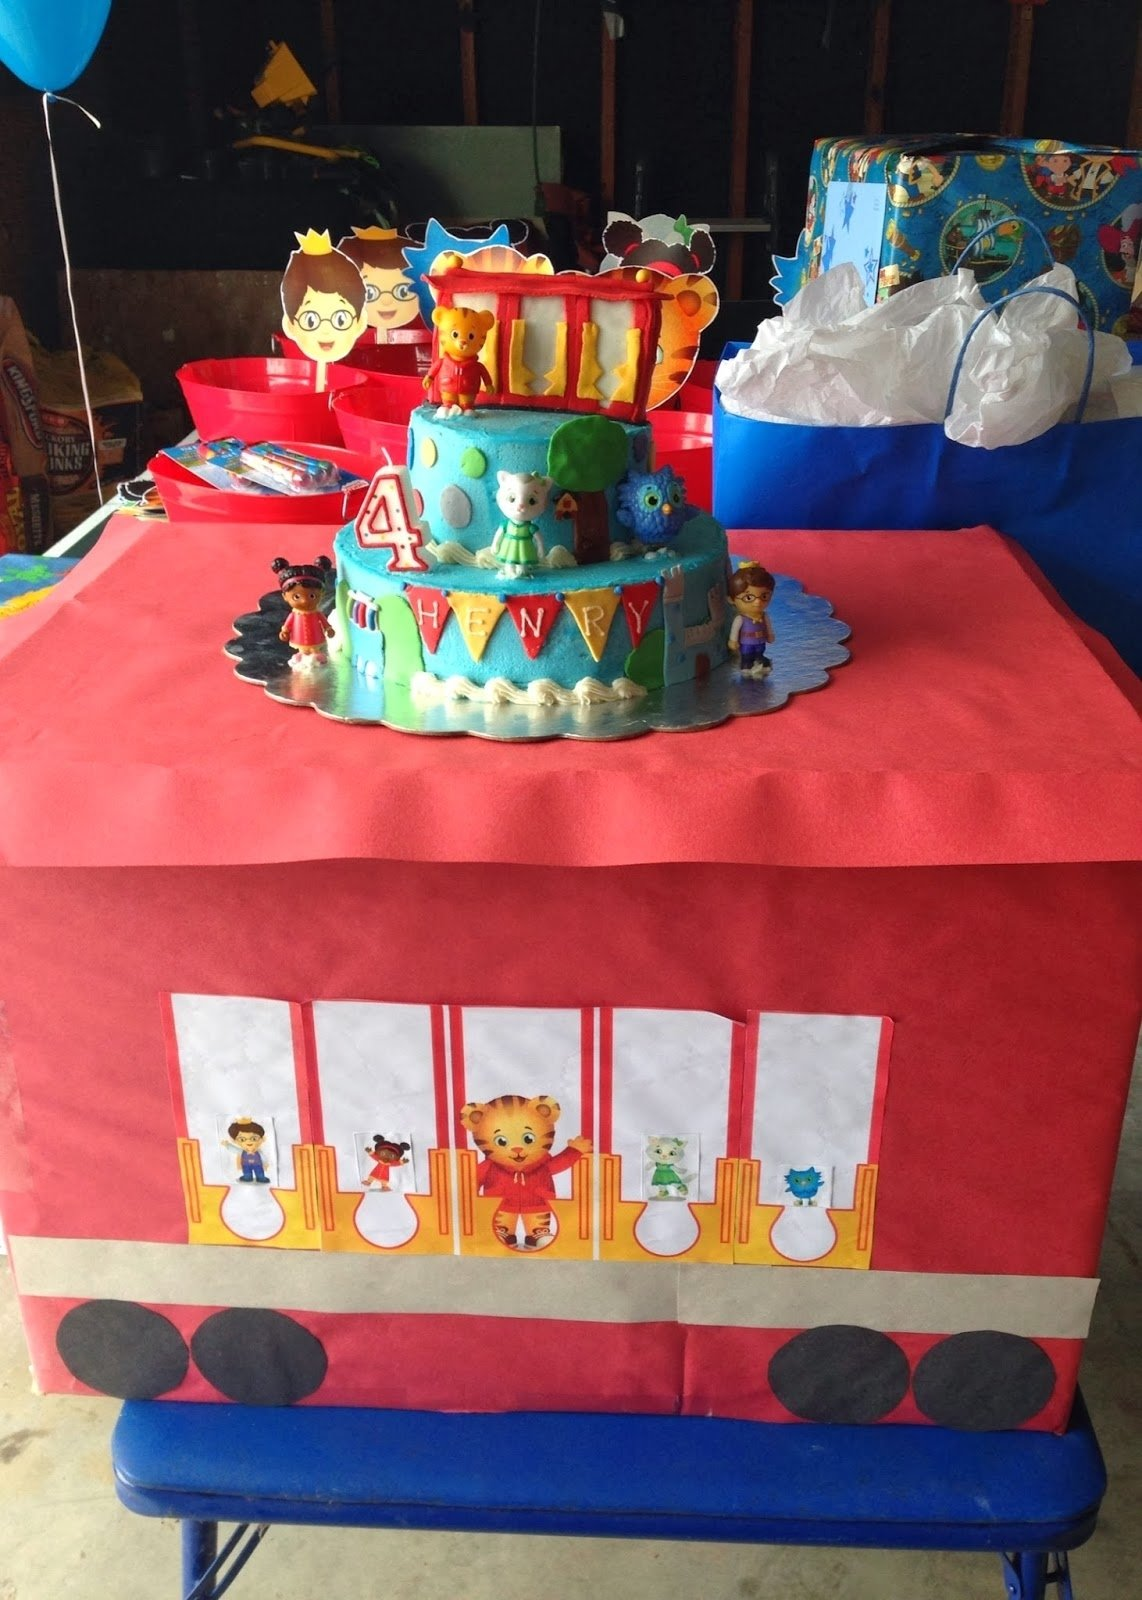 10 Famous Daniel Tiger Birthday Party Ideas daniel tiger dessert table google search party idea space 2021